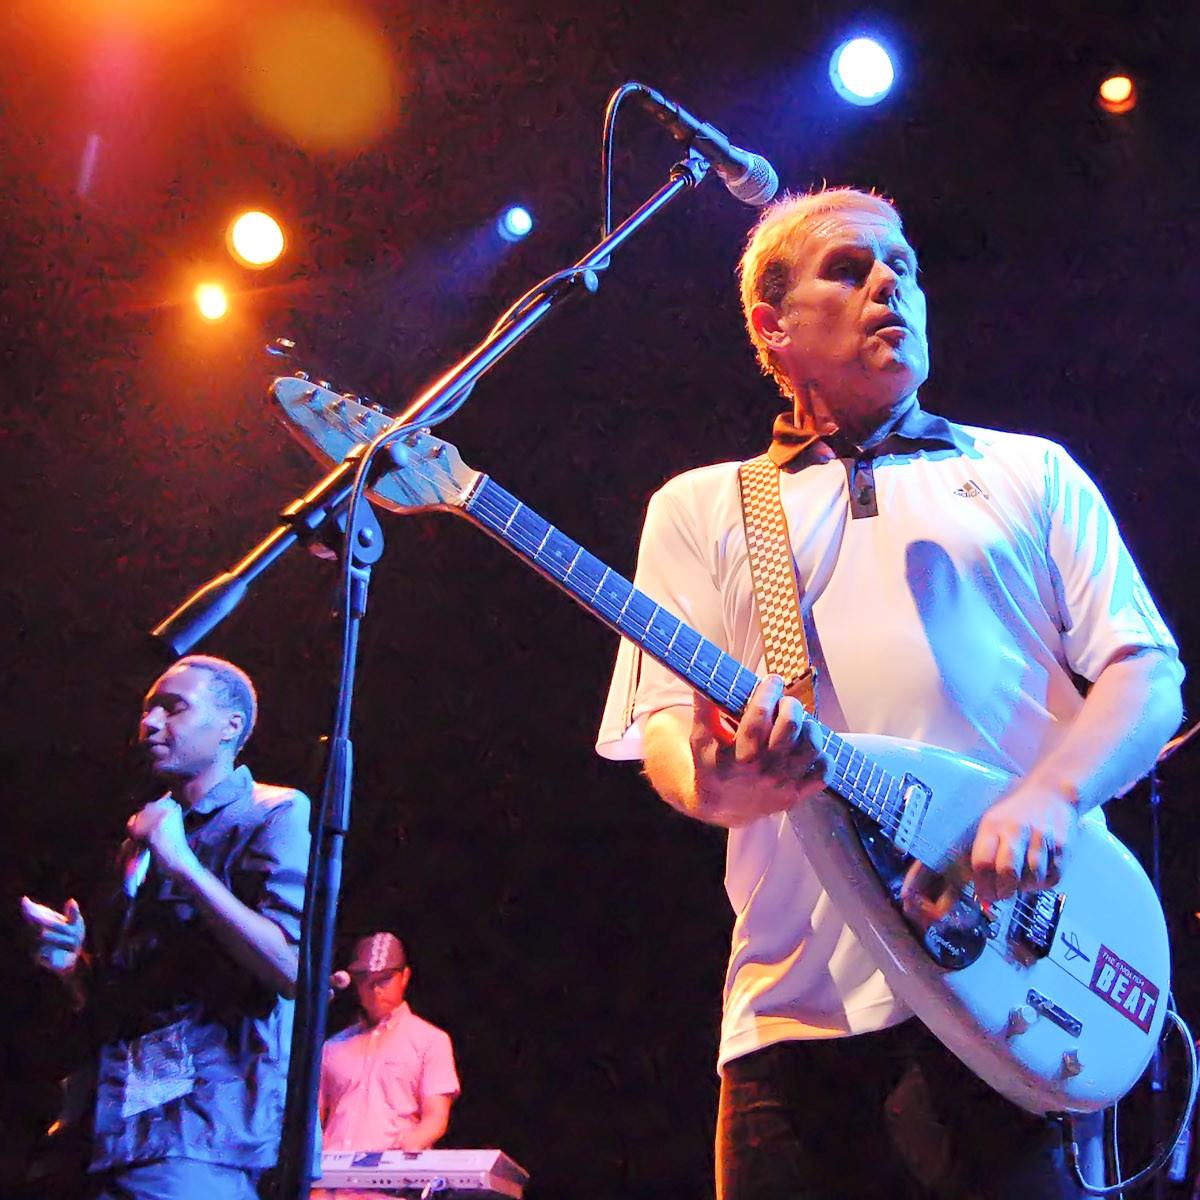 News_Michael D. Clark_concert picks_021210_The English Beat